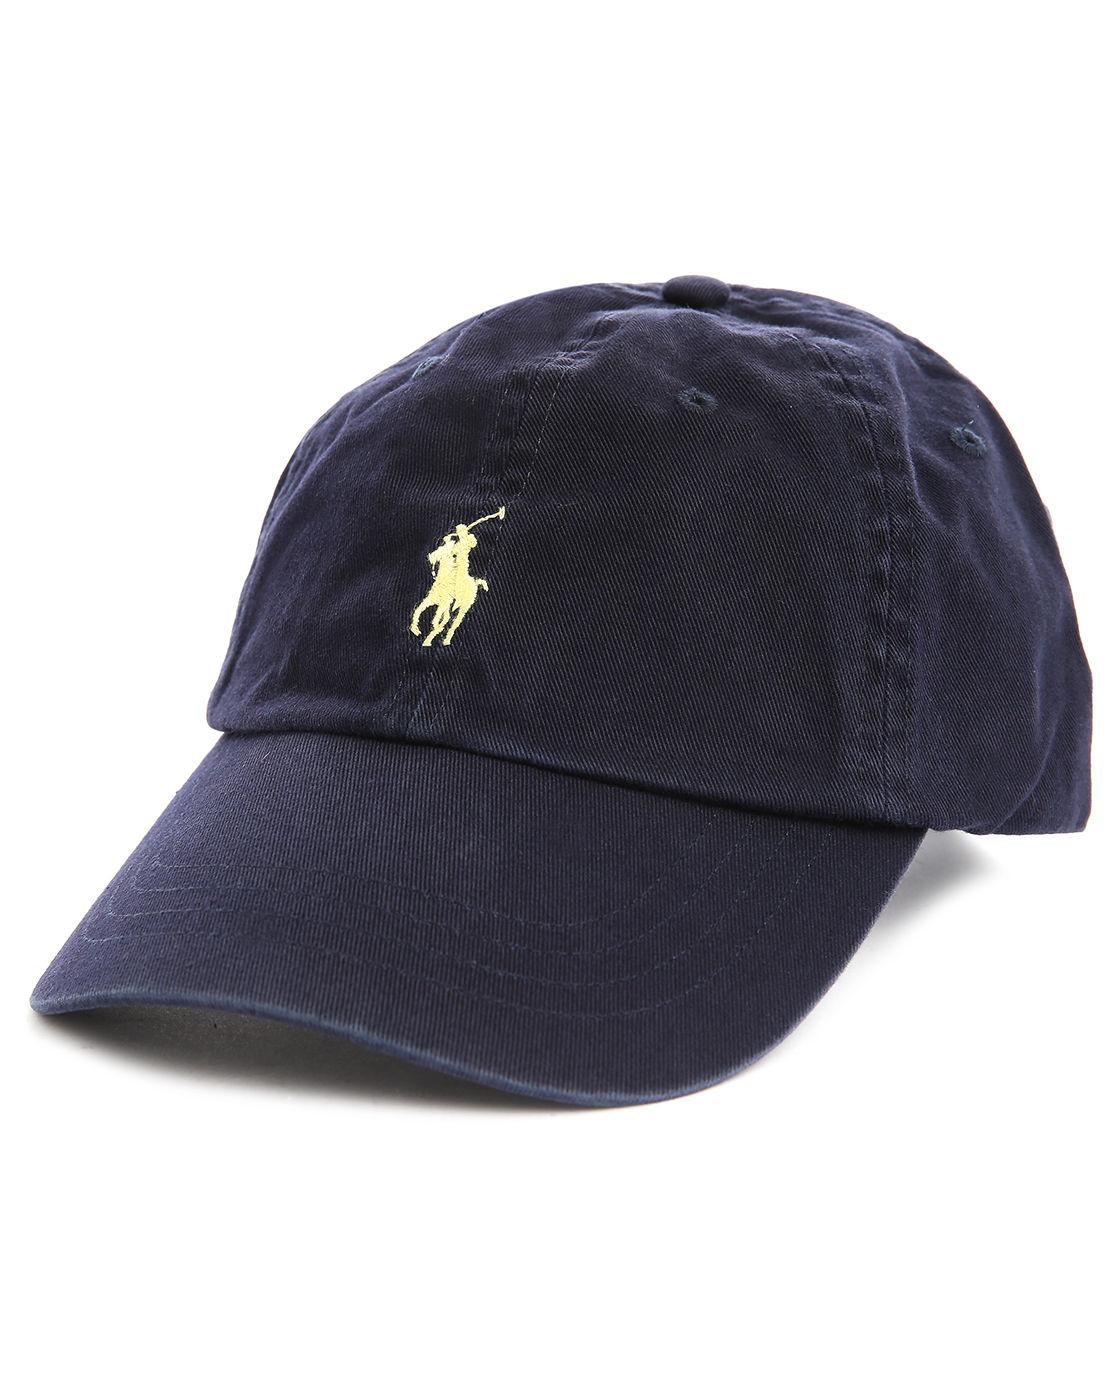 polo ralph lauren navy blue classic sport cap in blue for men lyst. Black Bedroom Furniture Sets. Home Design Ideas